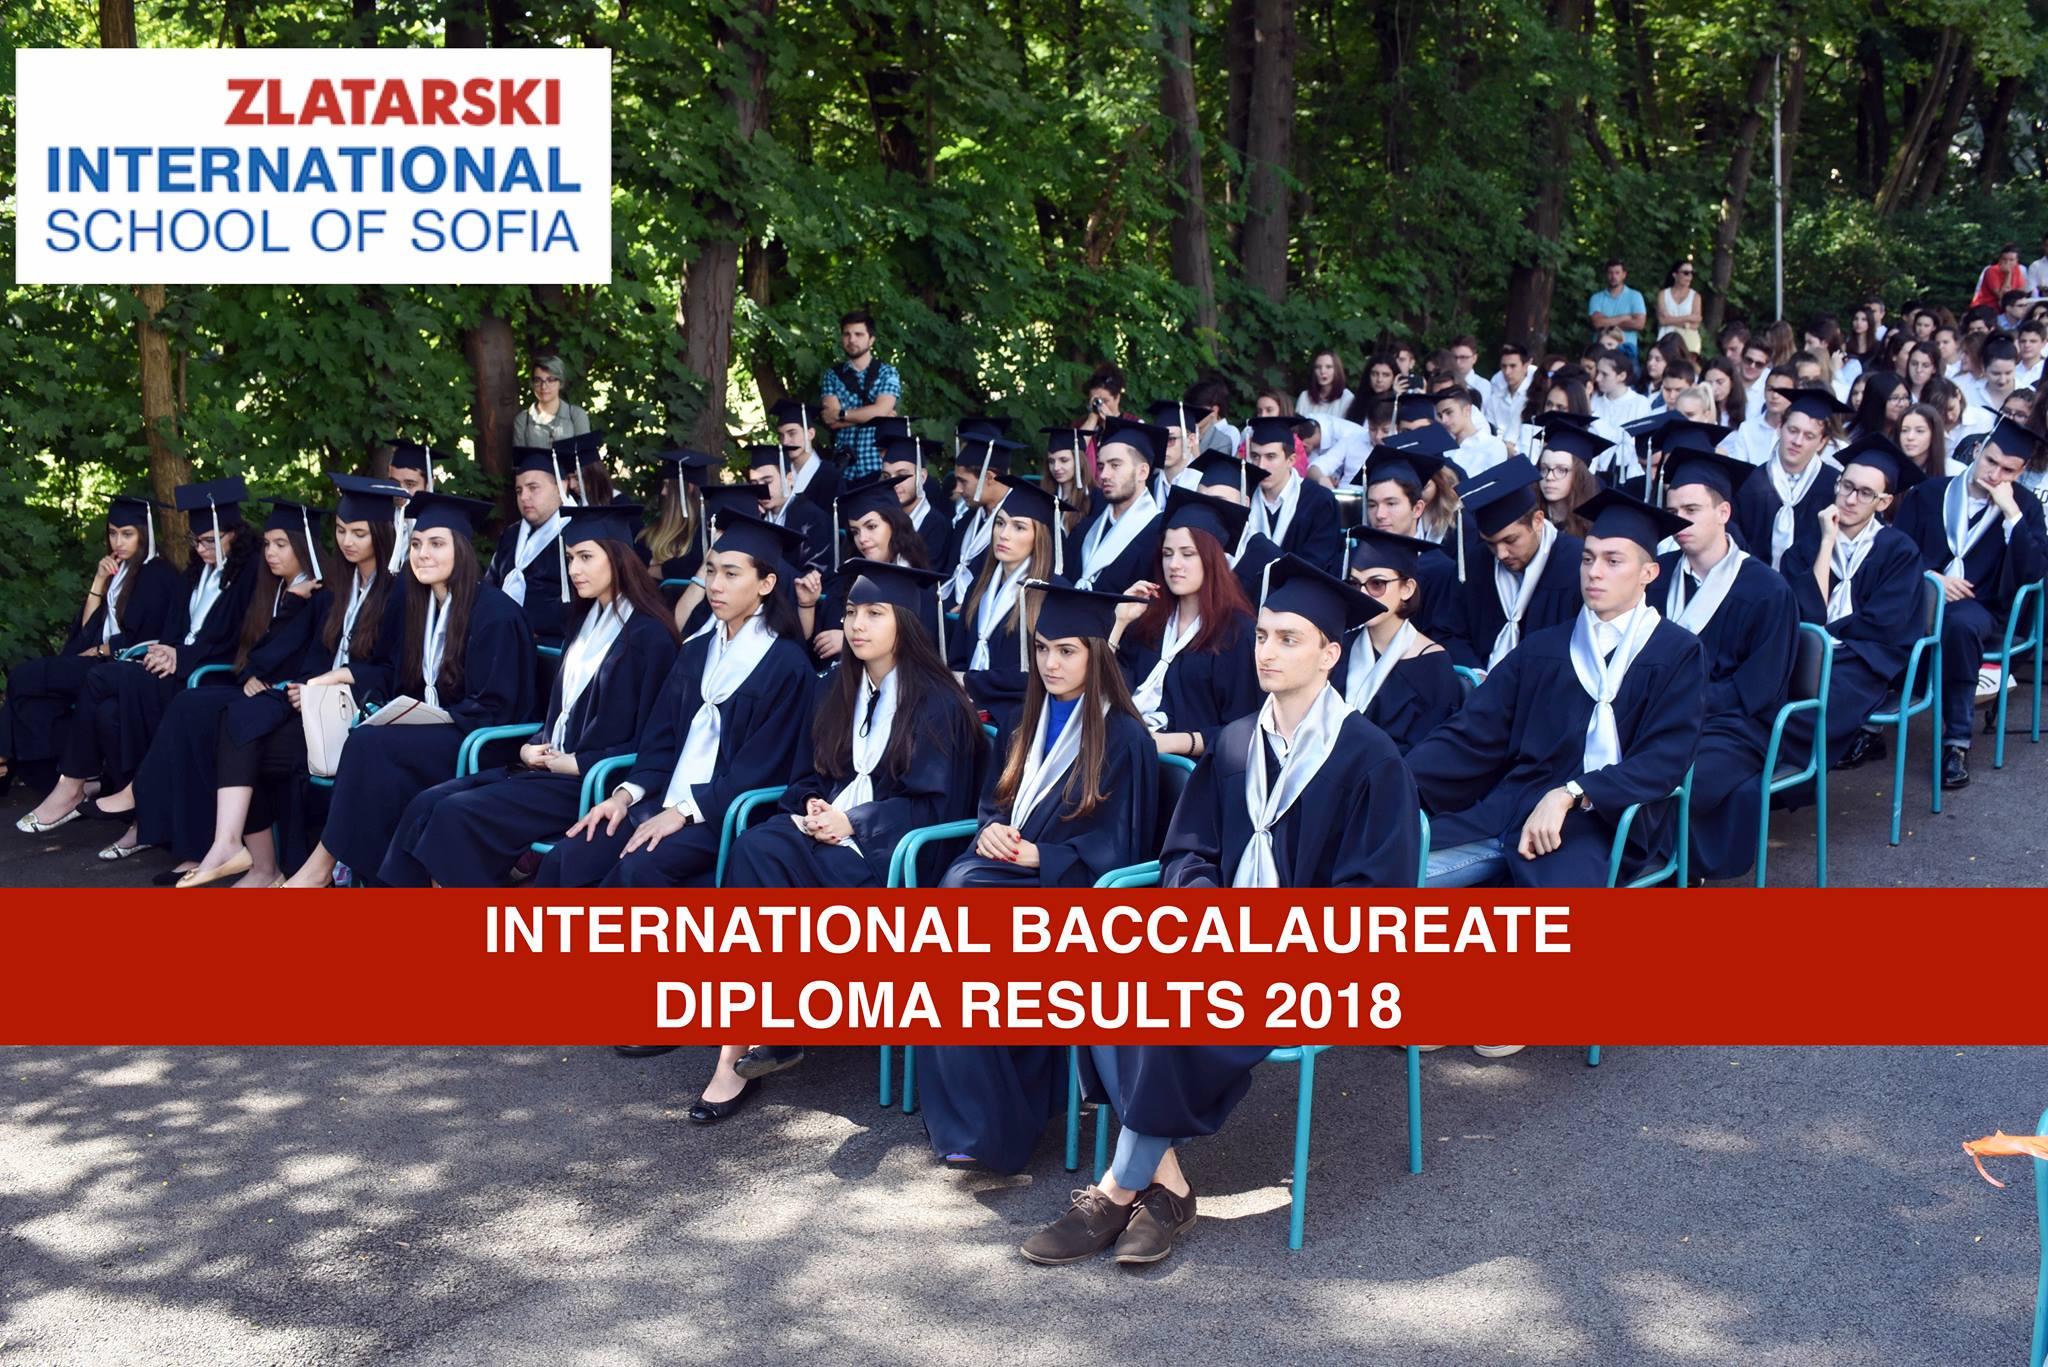 IB Results 2018: Поздравления Випуск 2018